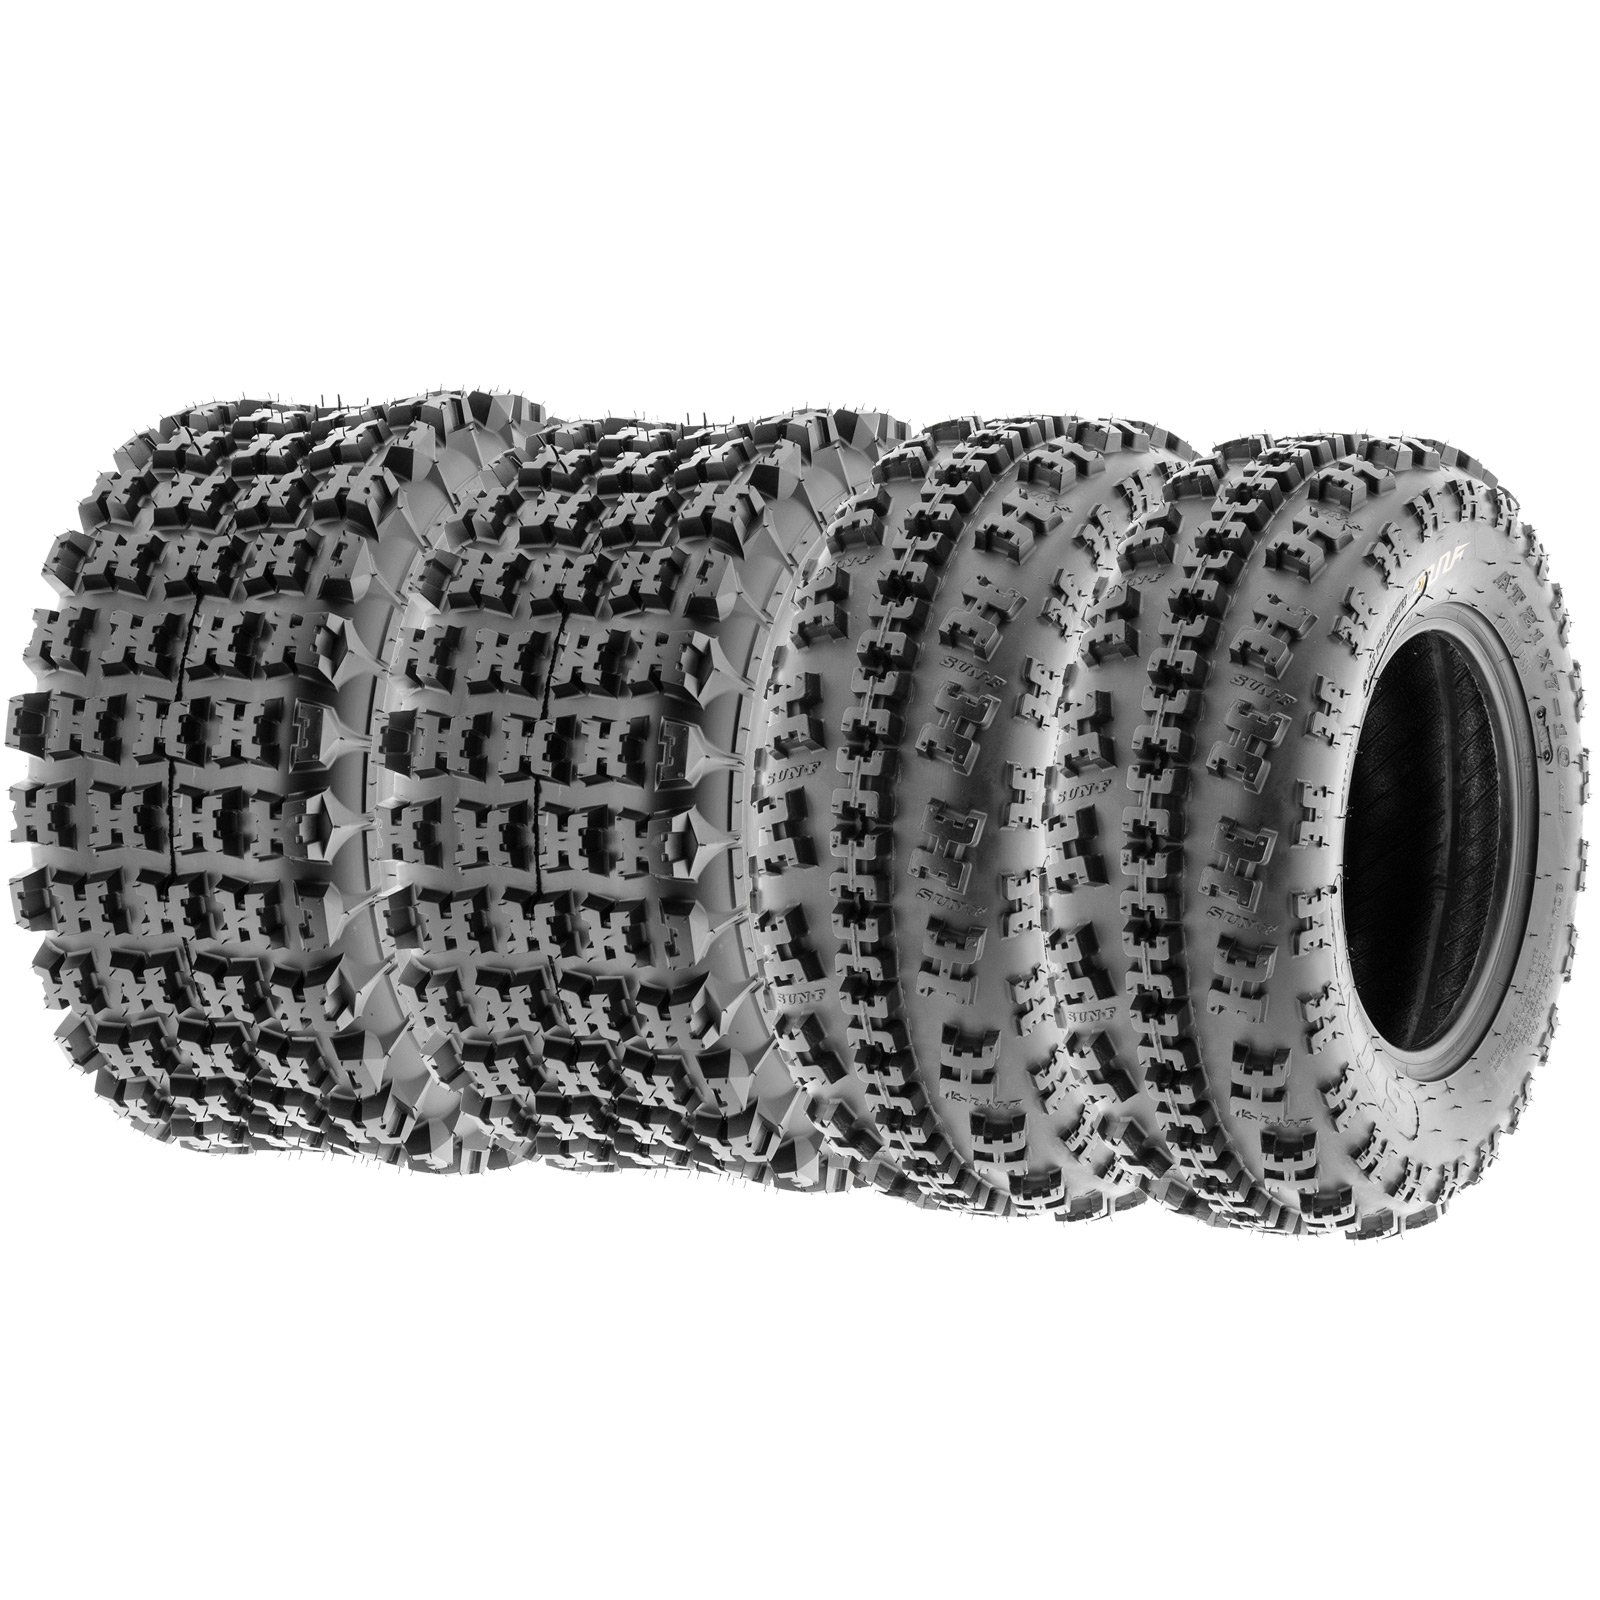 SunF 23x7-10 & 22x11-9 Knobby Sport ATV Tires 6 PR A027 (Full set of 4) by SunF